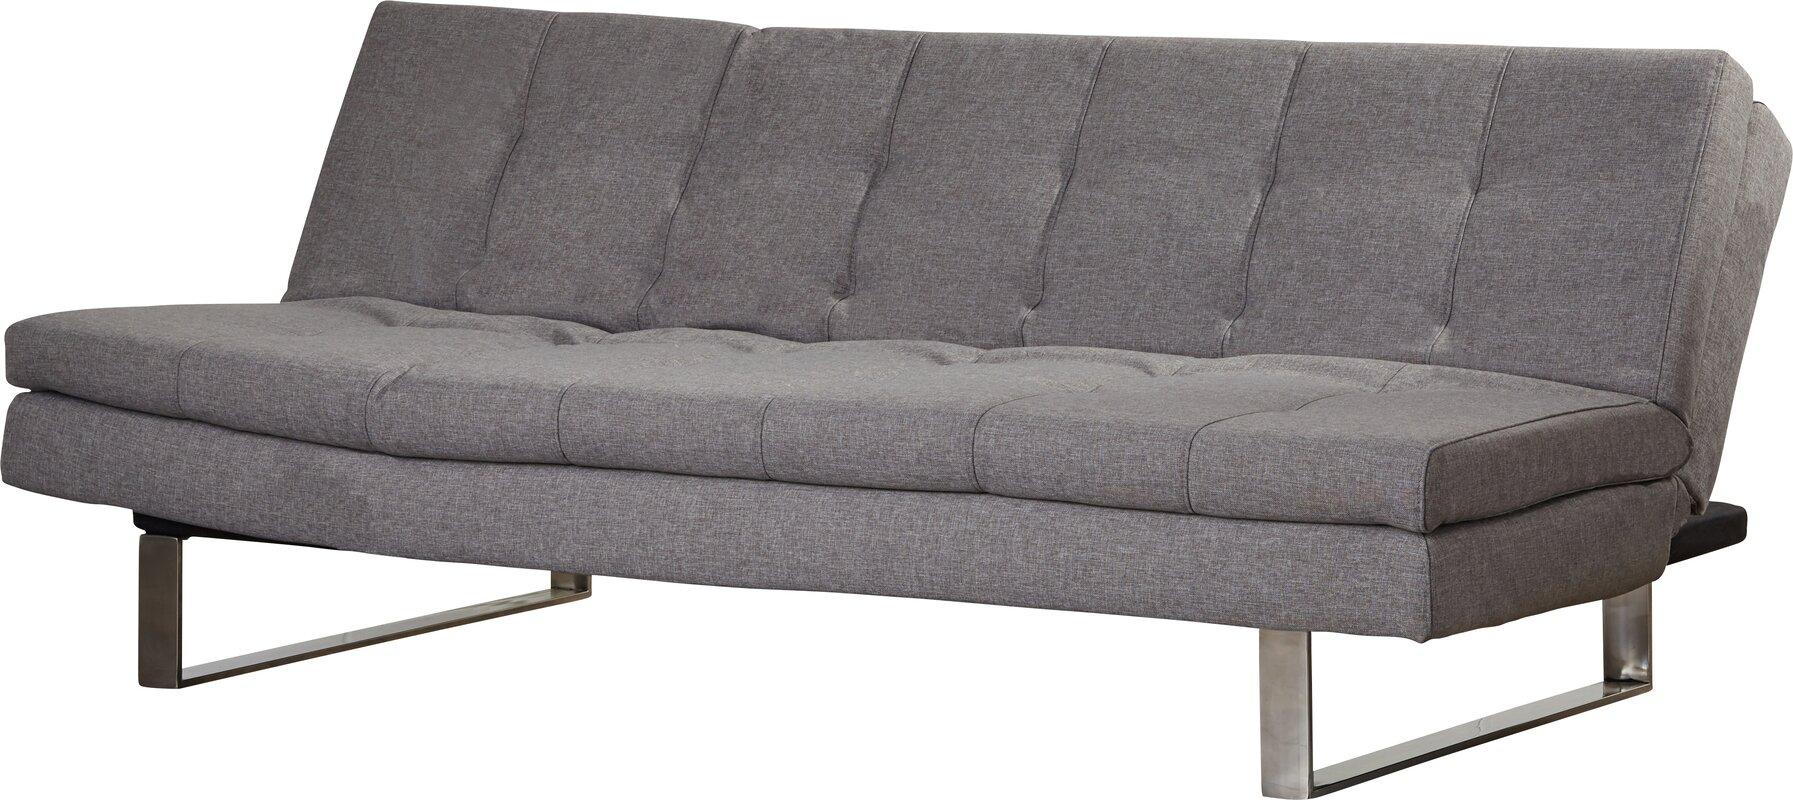 Milano 3 Seater Sofa Bed